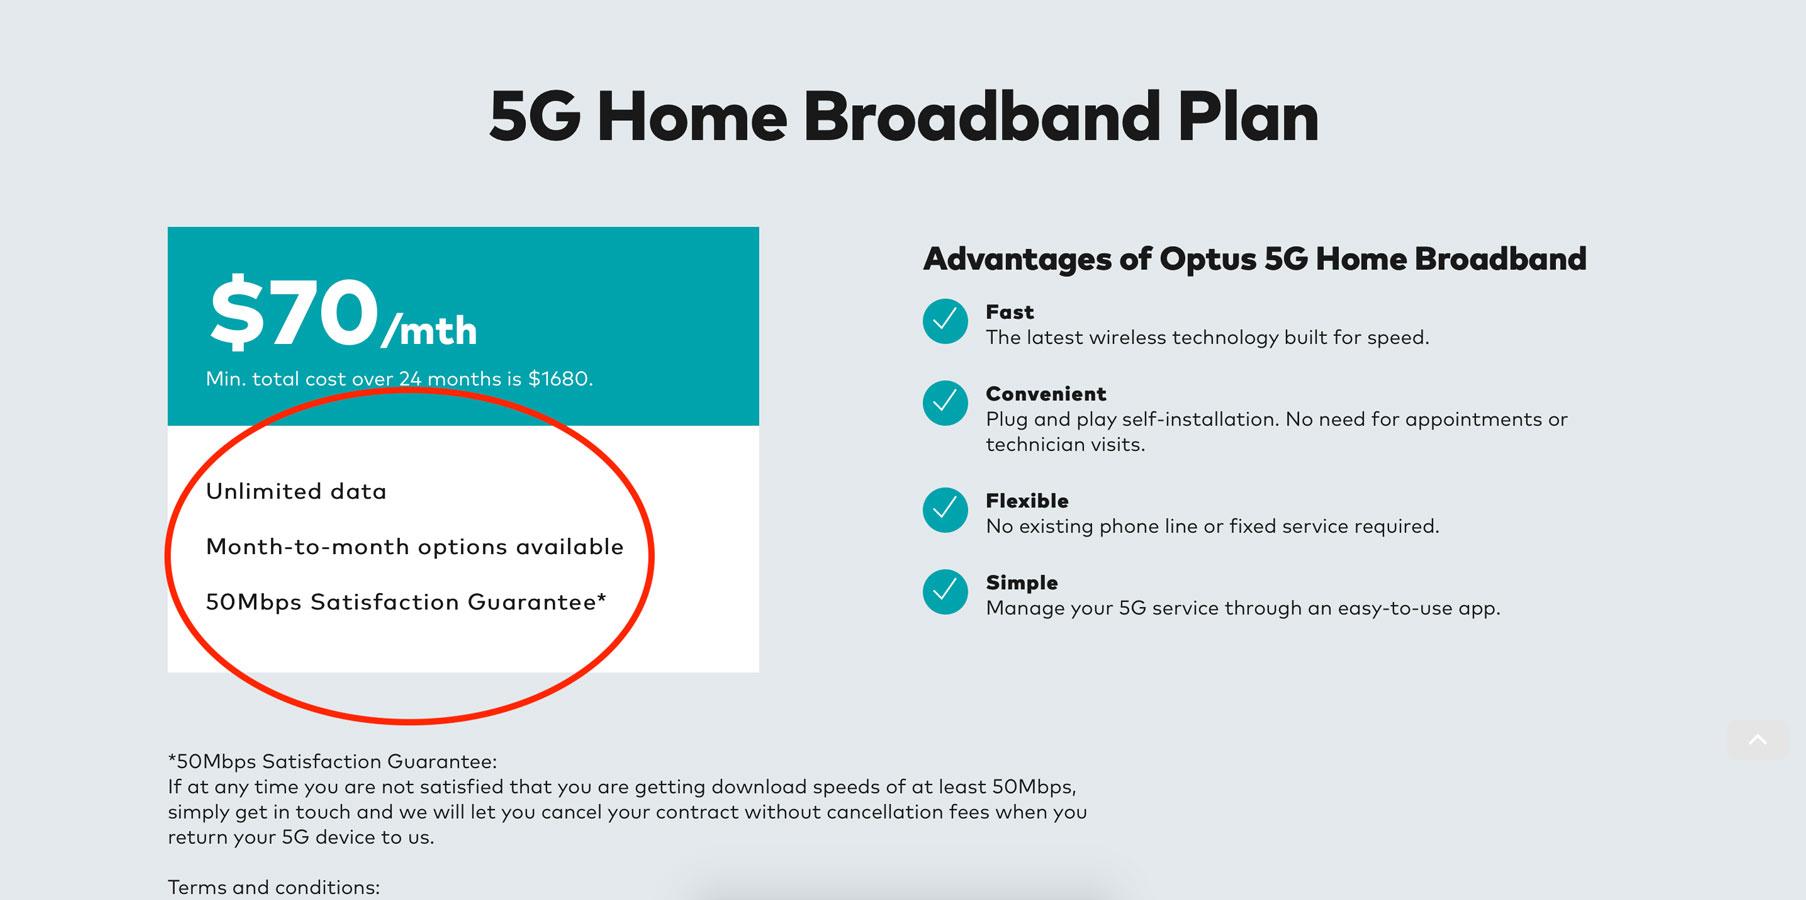 Optus-5G-Home-Broadband-Plan-Information